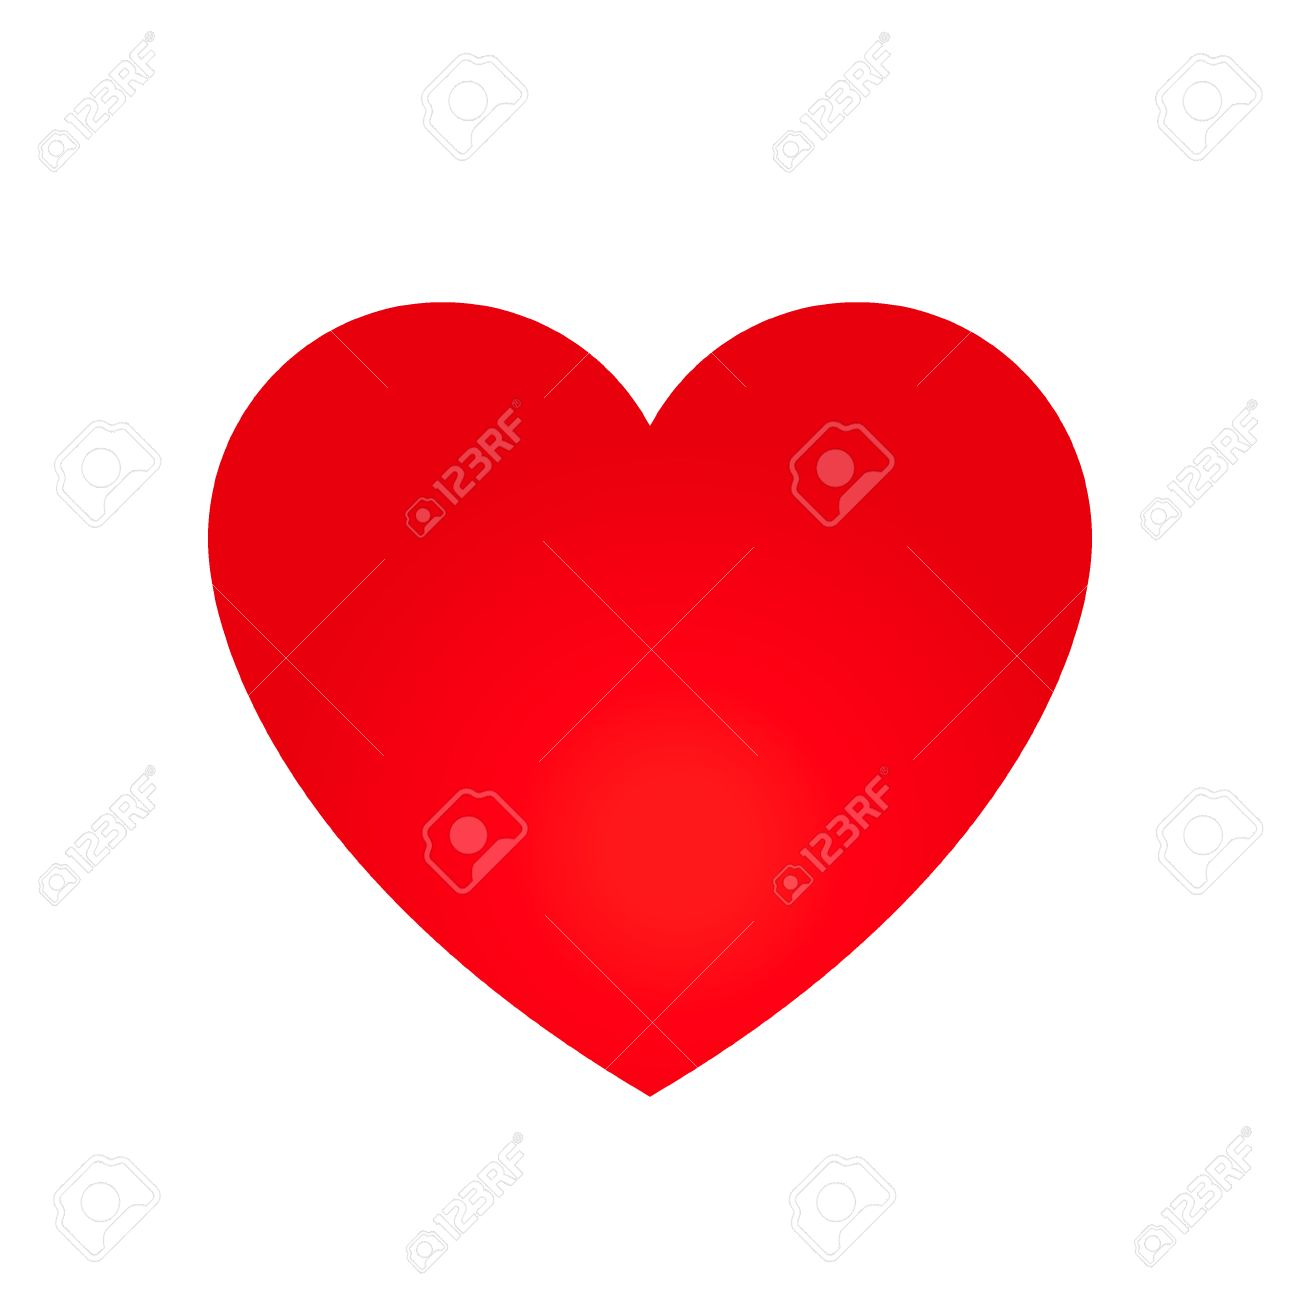 vector heart shape symbol illustration royalty free cliparts rh 123rf com vector heart shape illustrator vector heart shape outline